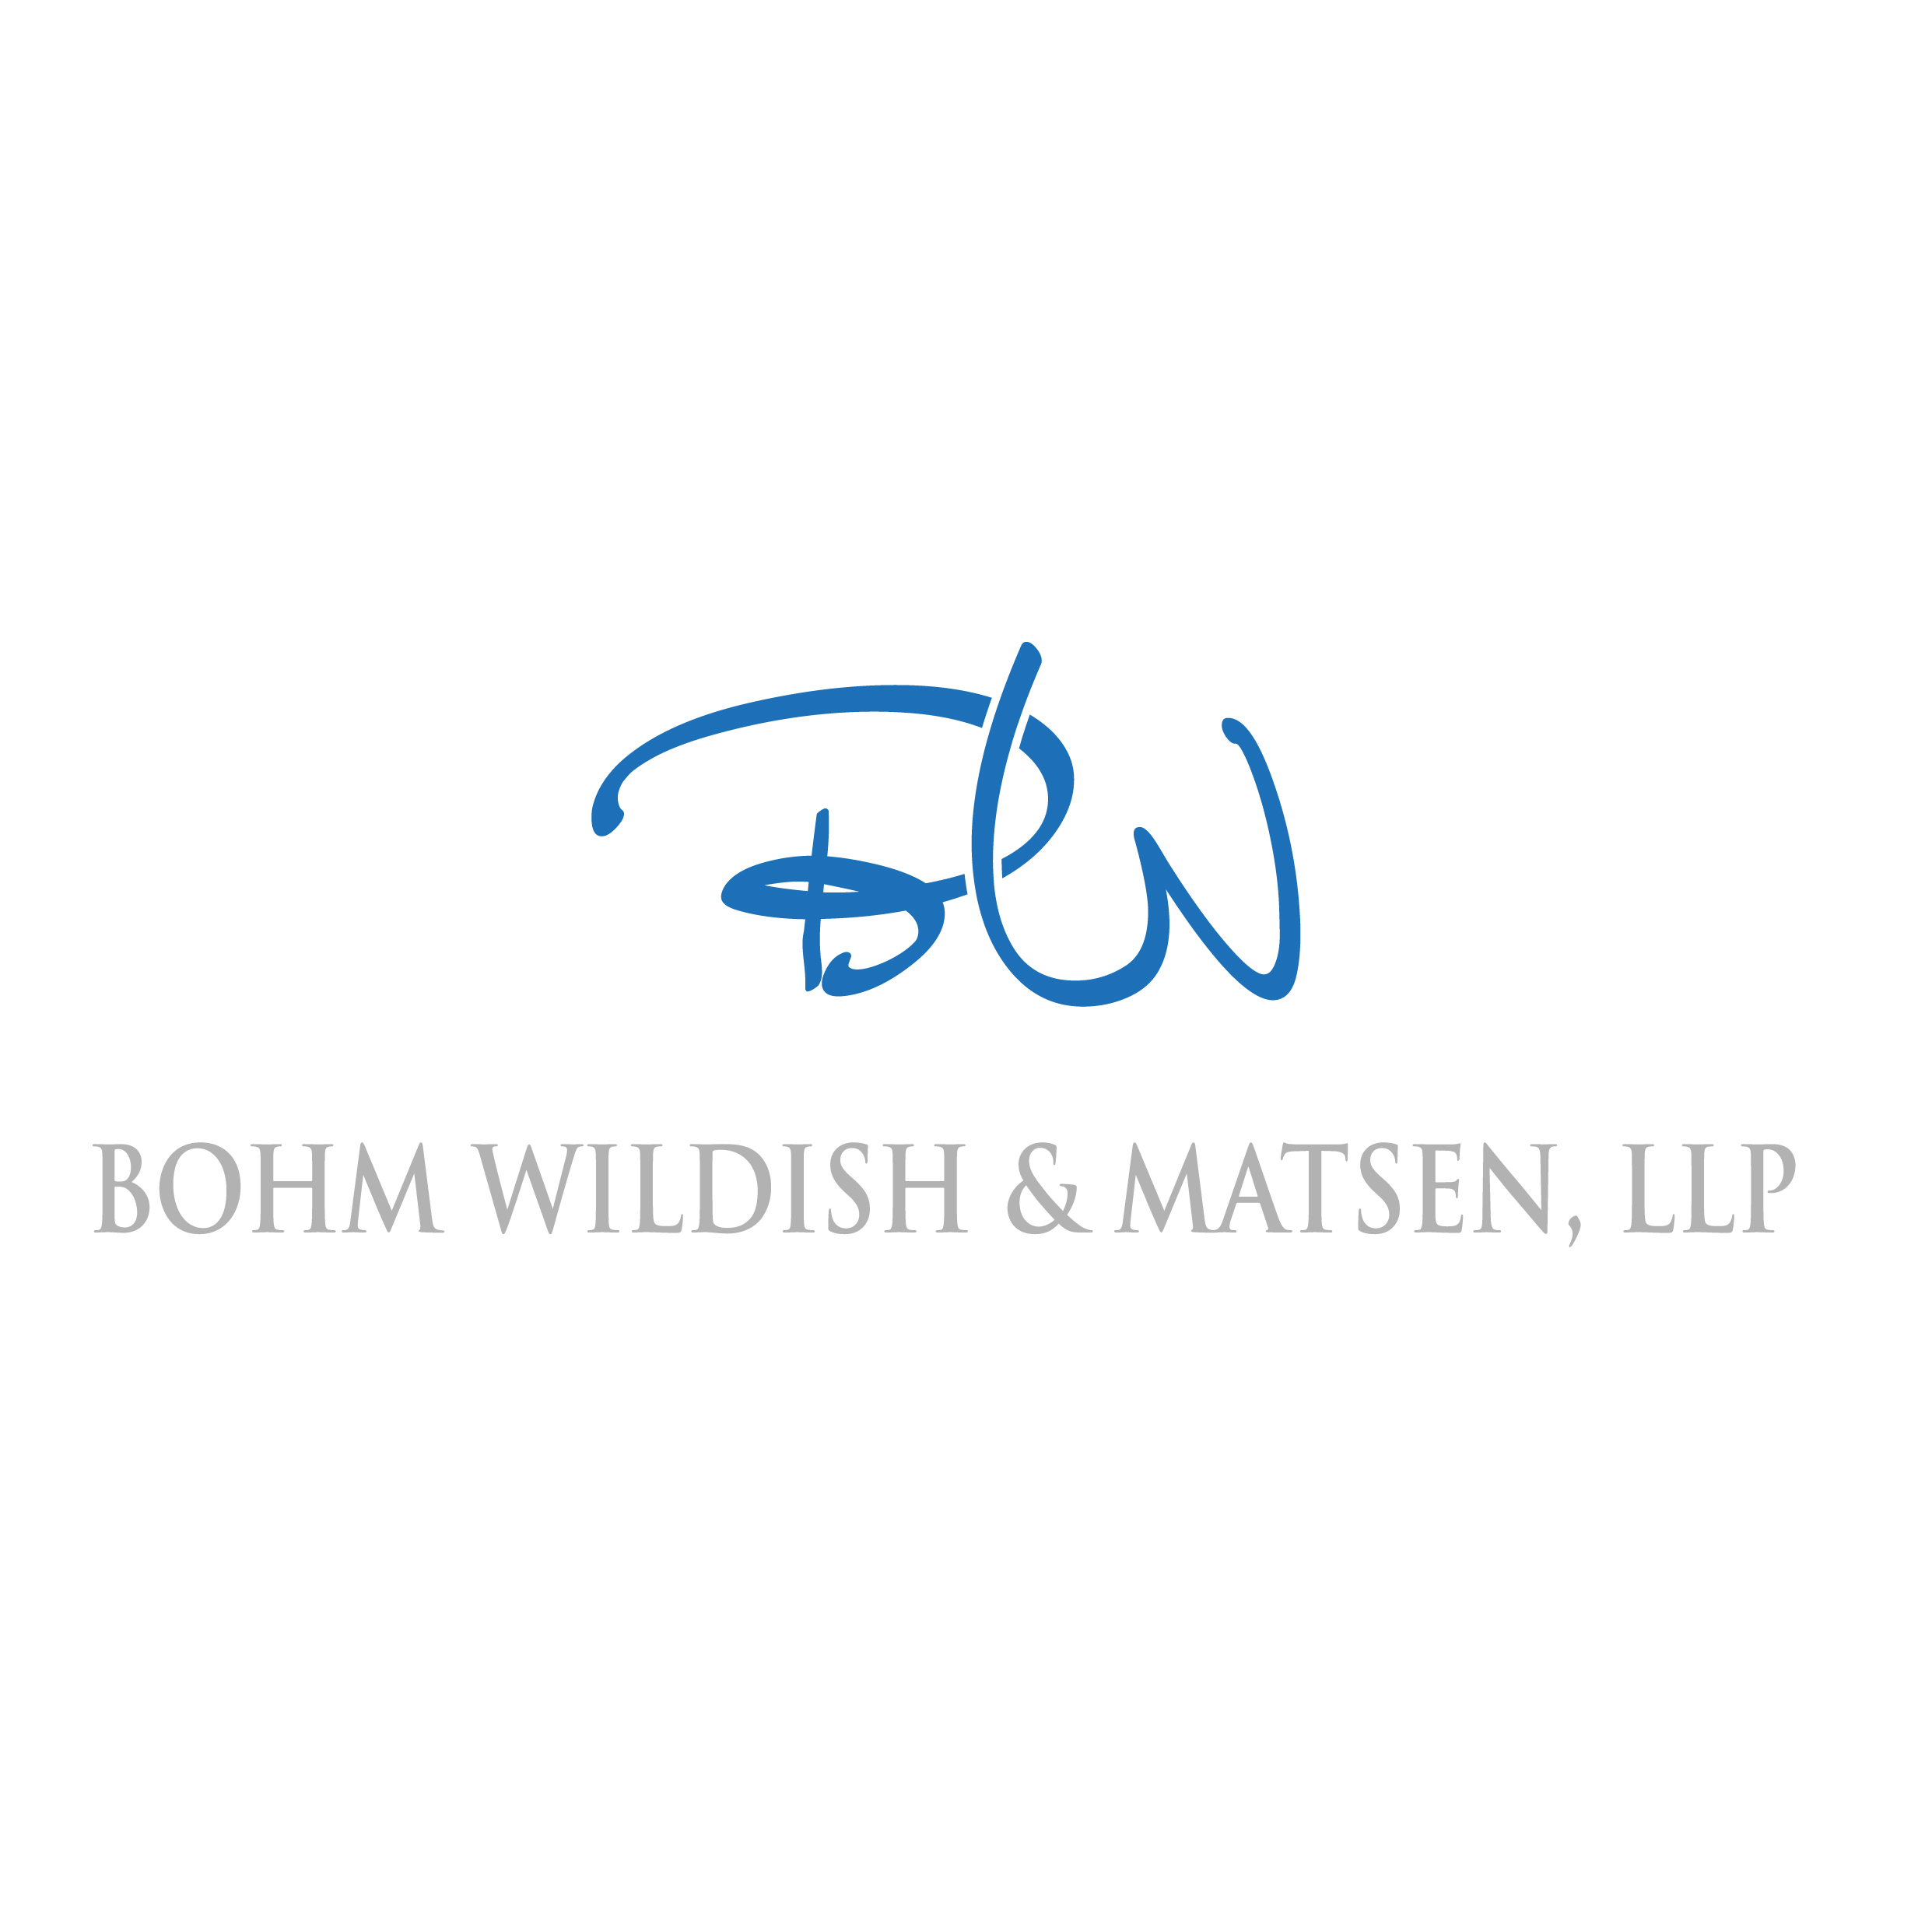 Bohm, Wildish & Matsen, LLP